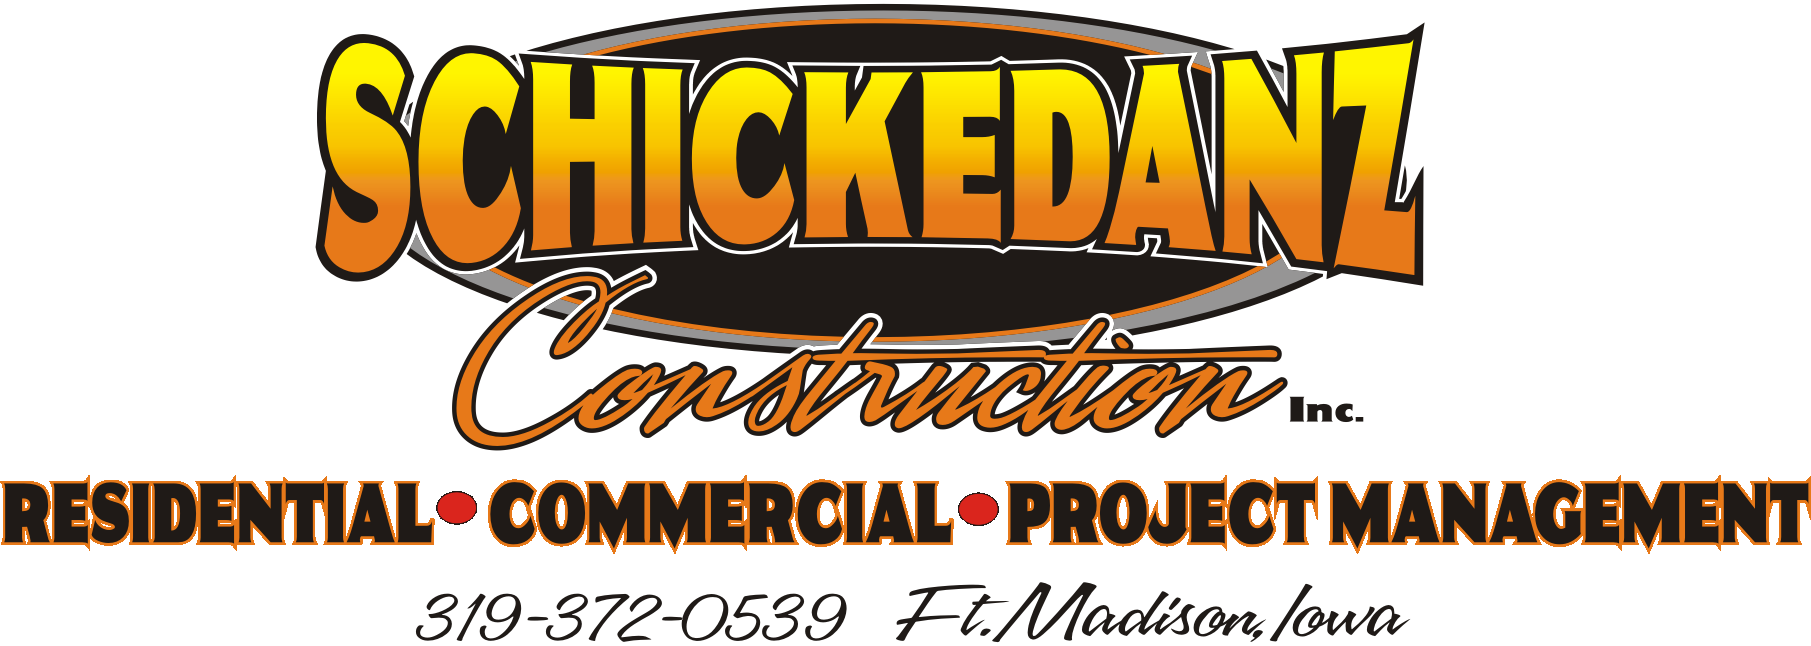 Schickedanz Construction, Inc